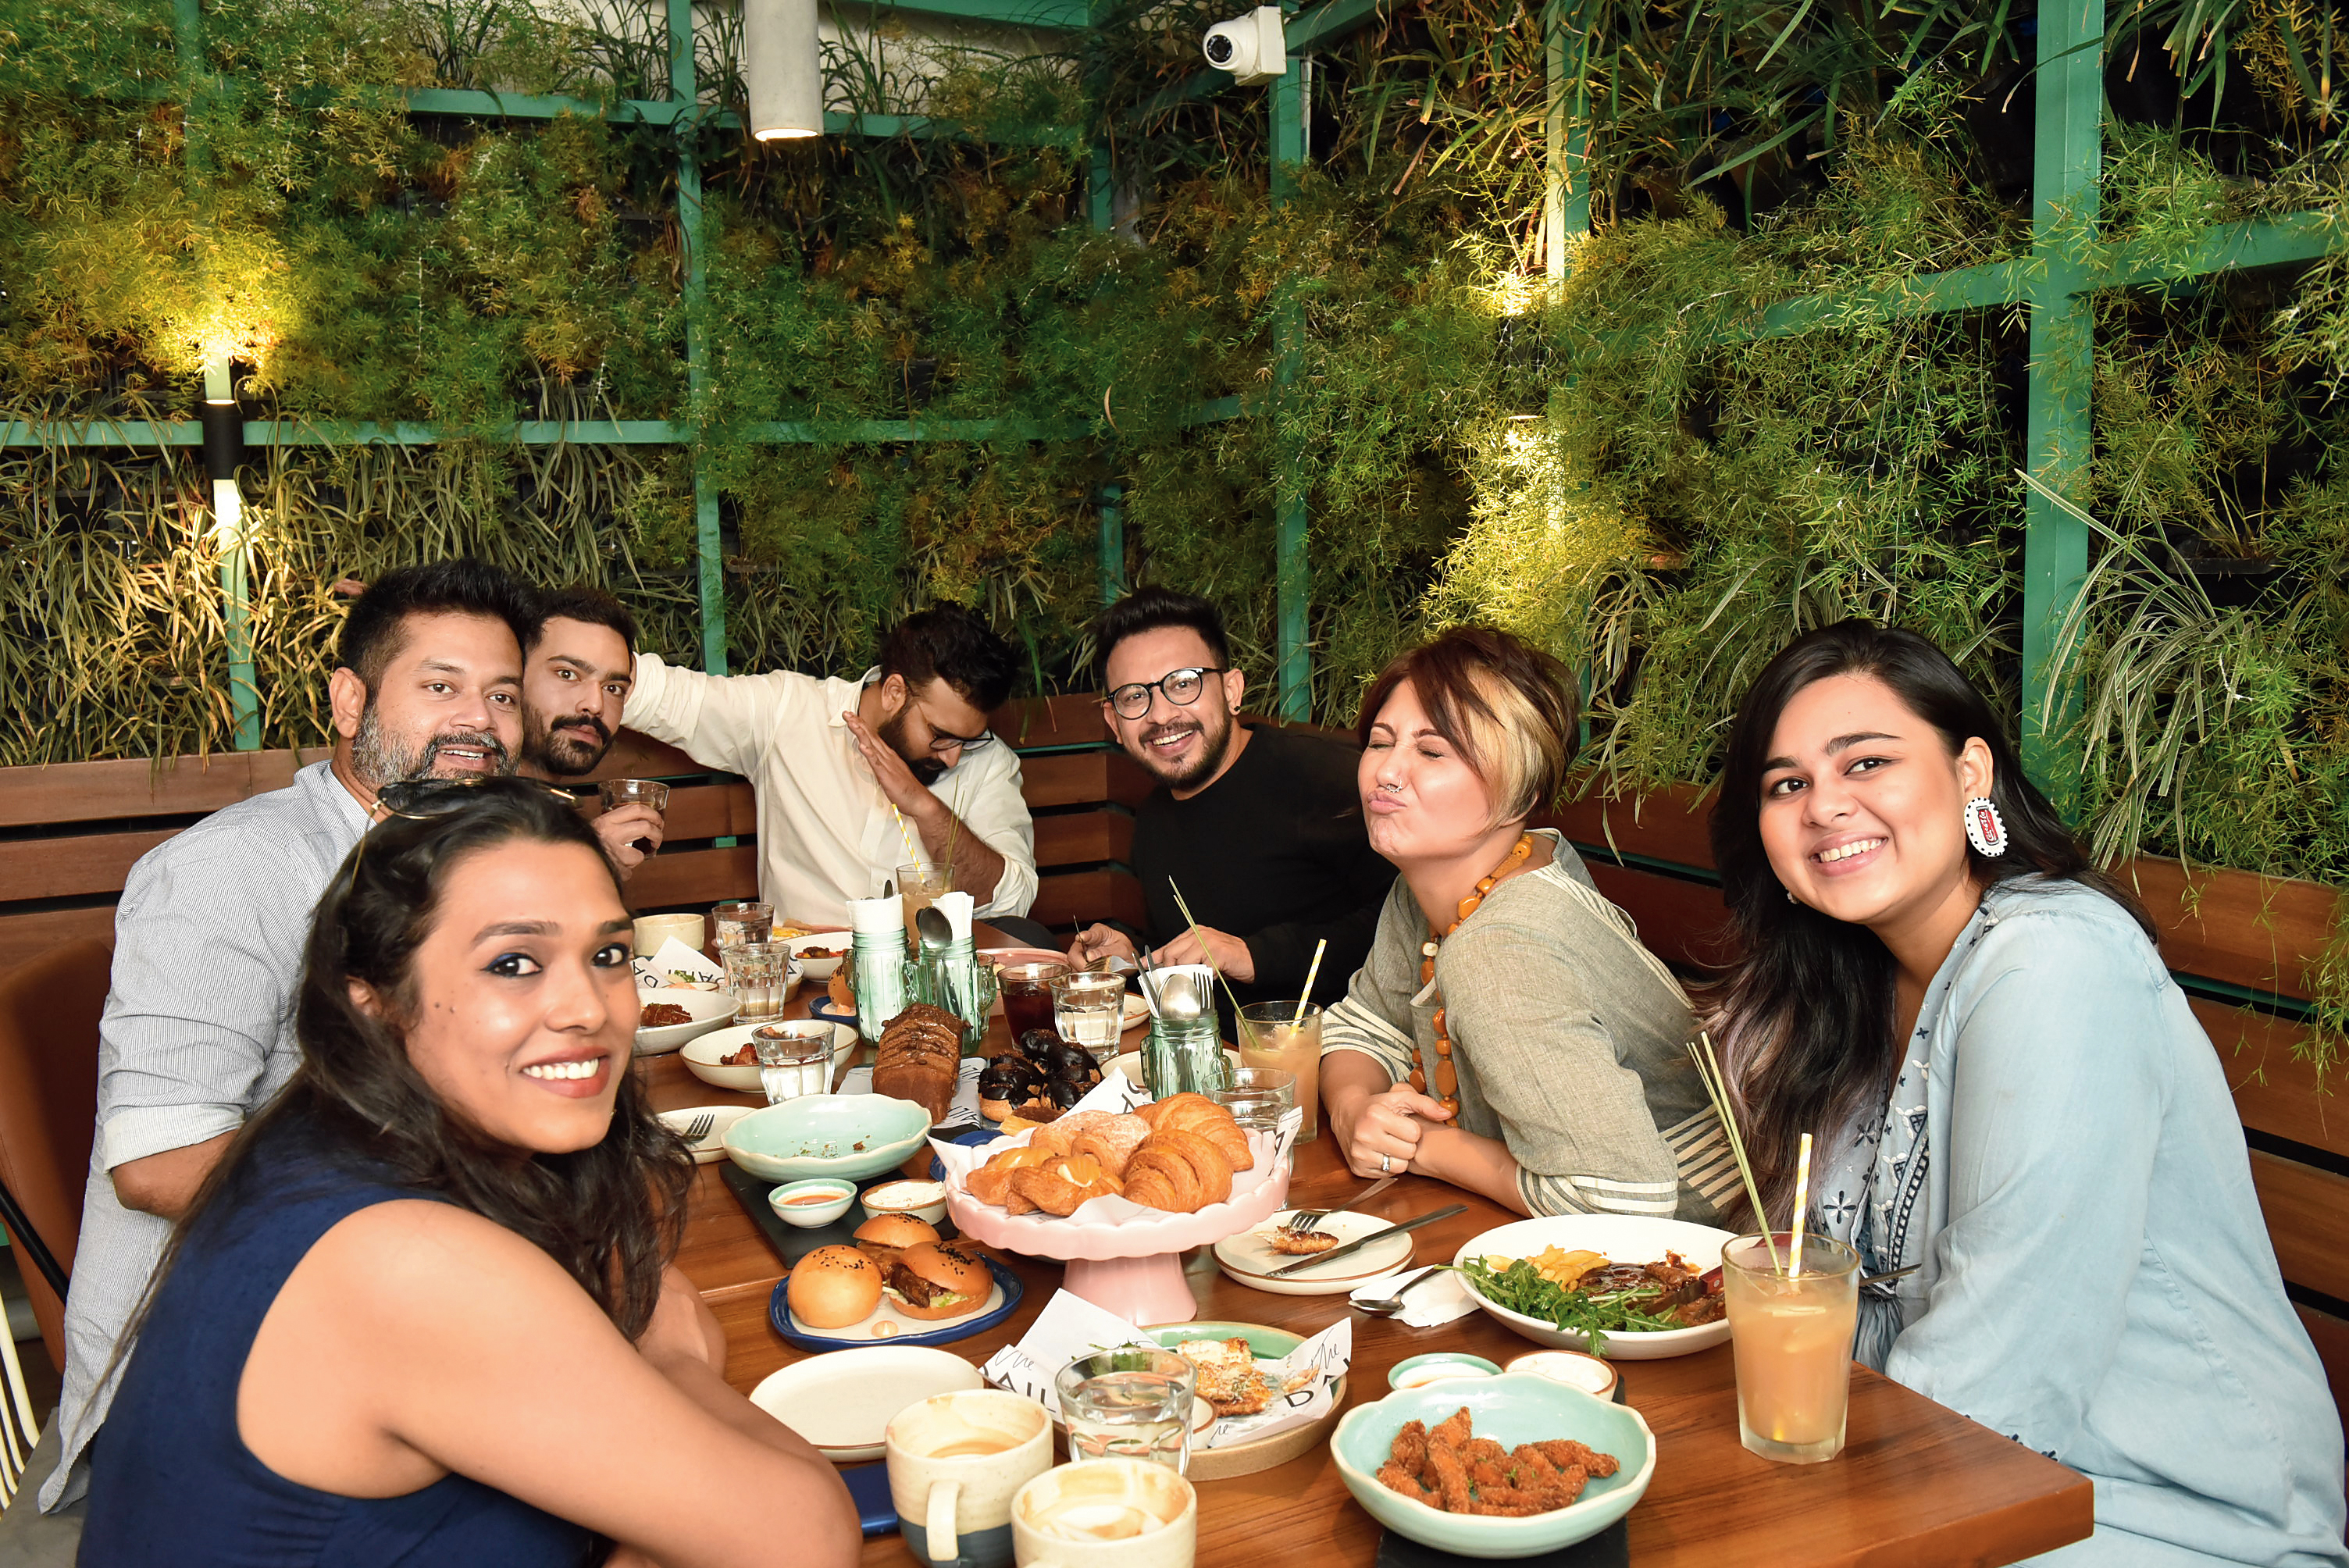 Rimi Nayak, Sayantan Sarkar, Ayushman Mitra, Rohan Arora, Anindya Chatterjee, Swastika Mukherjee and Anwesha Mukherjee at The Daily in happier, pre-Covid times.